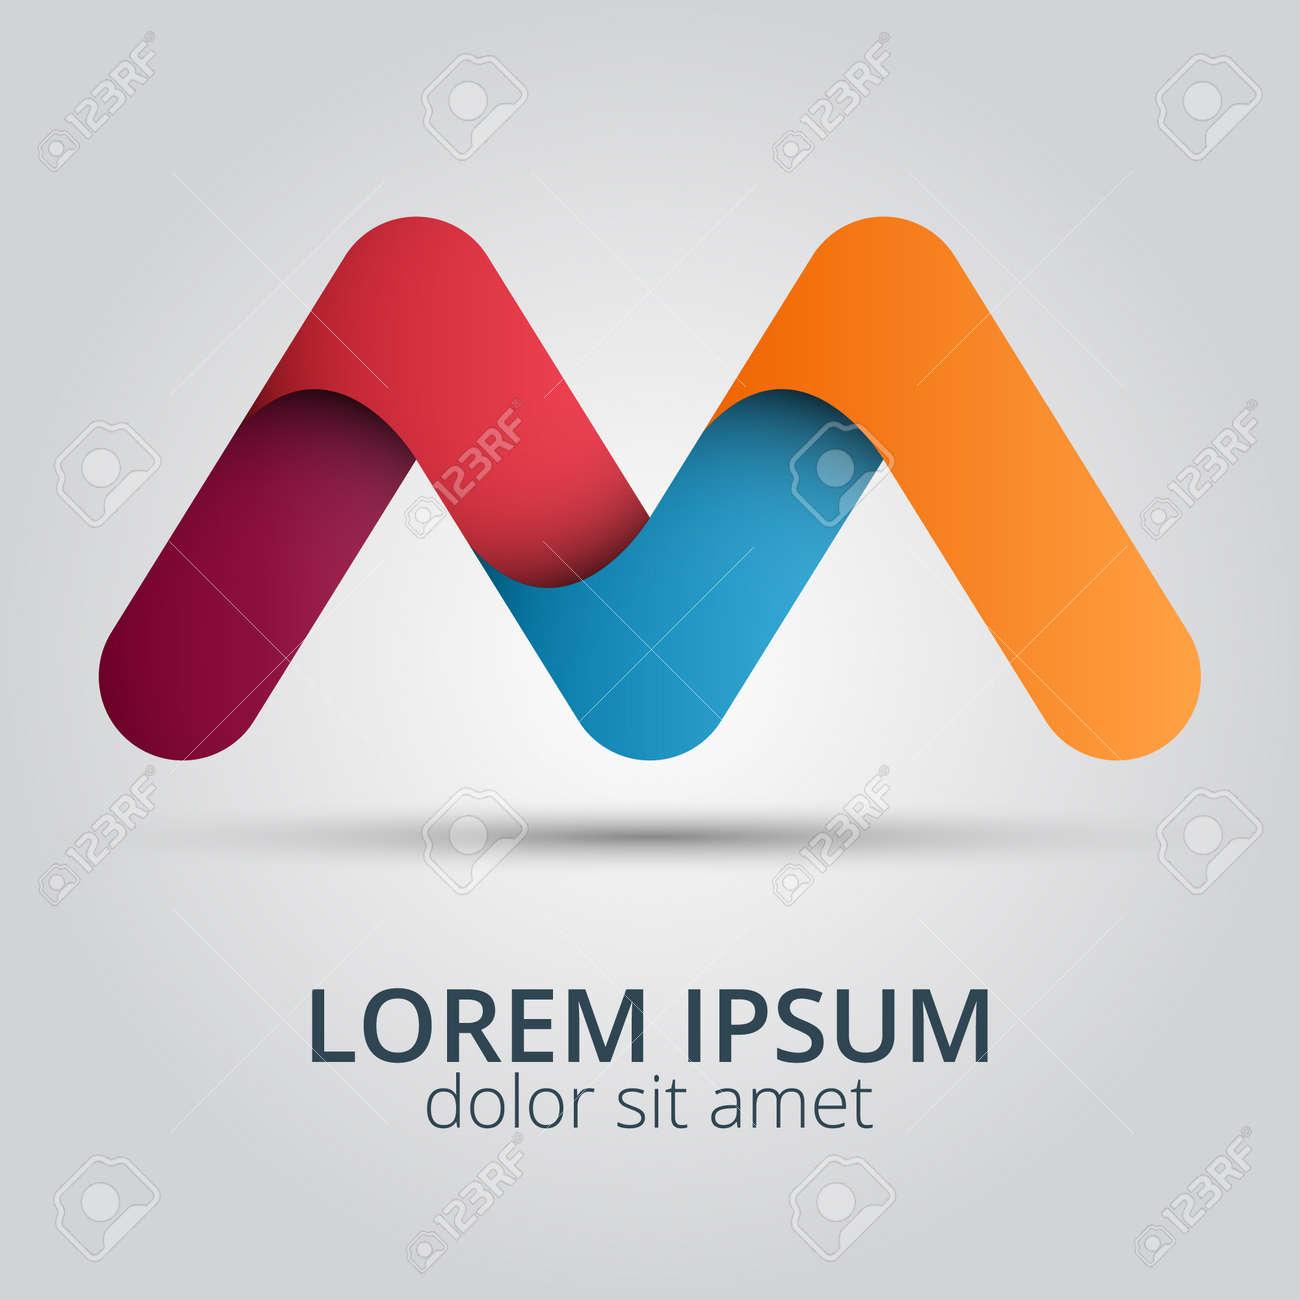 hight resolution of letter m logo icon design template elements creative design icon illustration